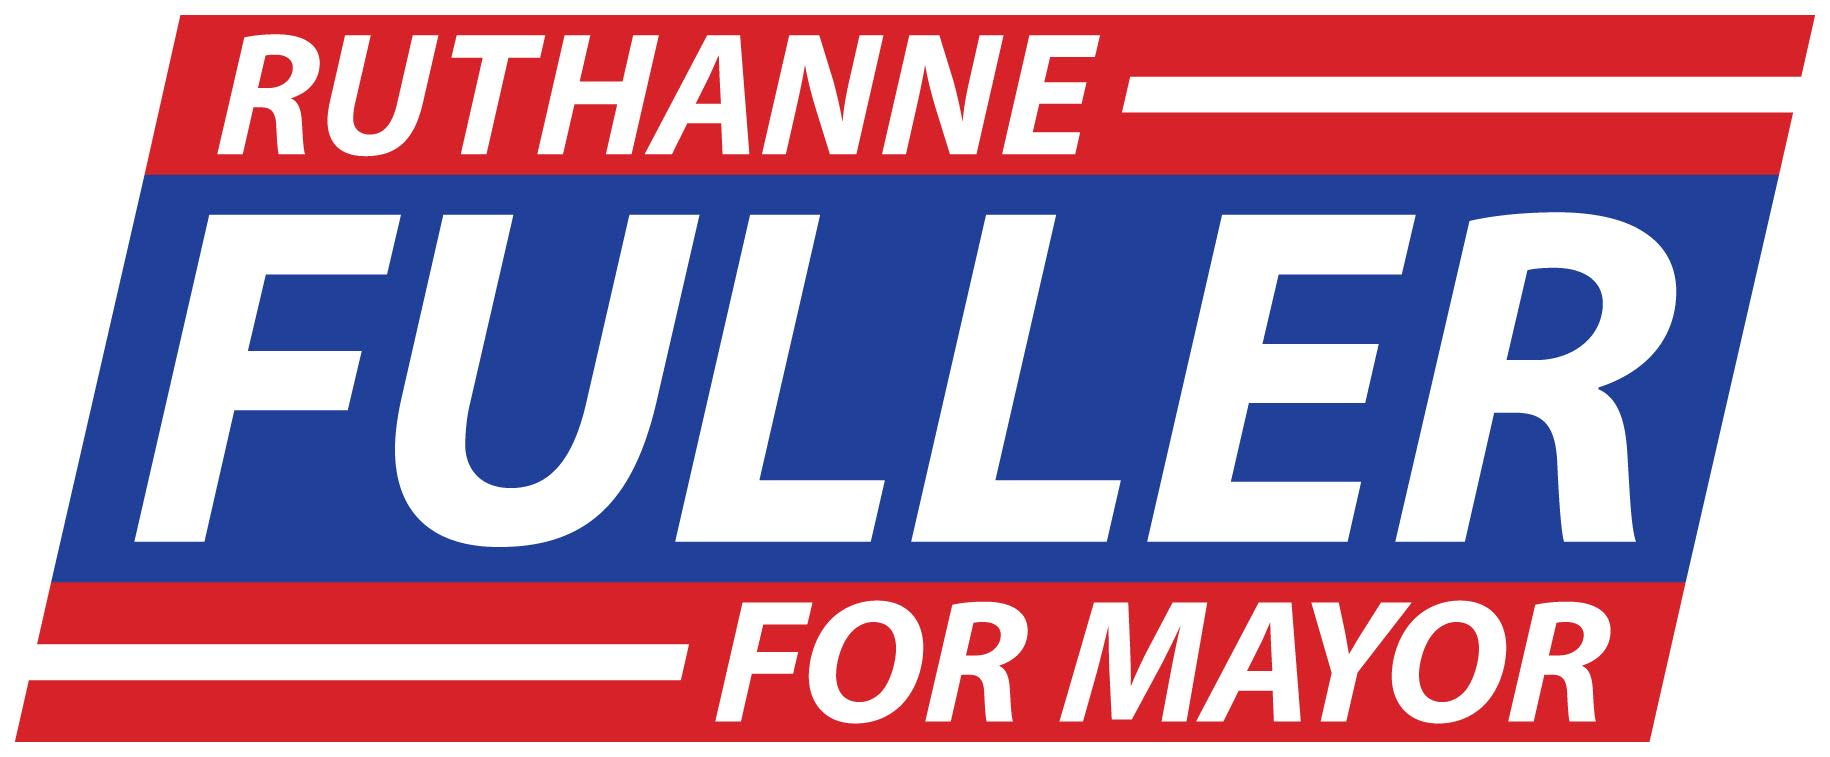 Ruthanne Fuller